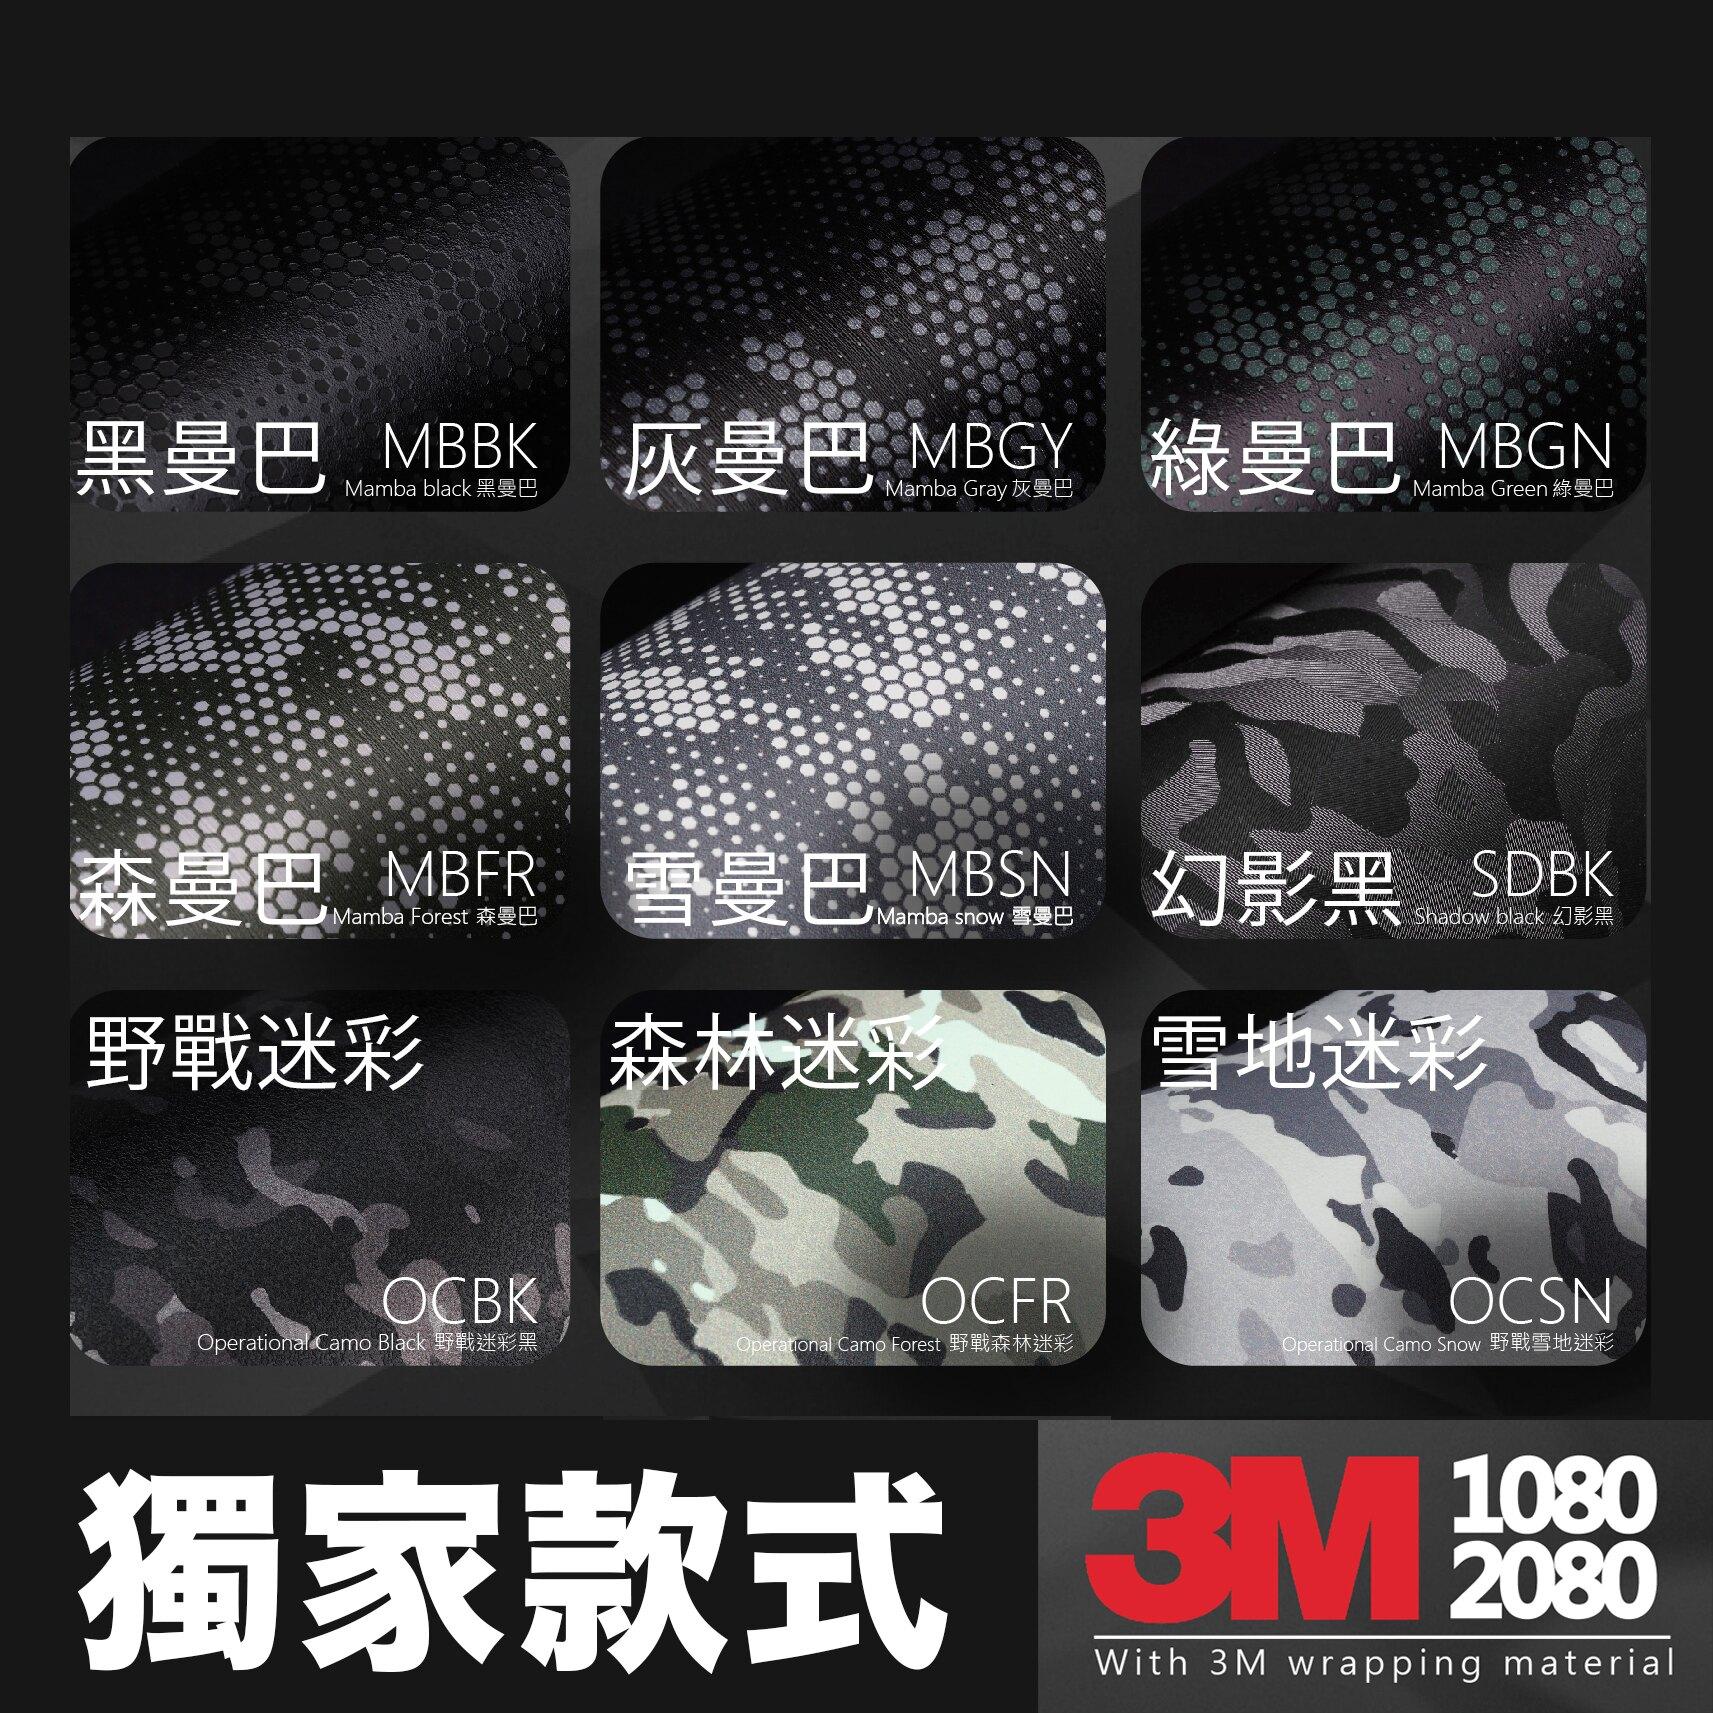 LIFE+GUARD 相機 鏡頭 包膜 SIGMA 14-24mm F2.8 DG DN Art (E-mount / L-mount)  (獨家款式)